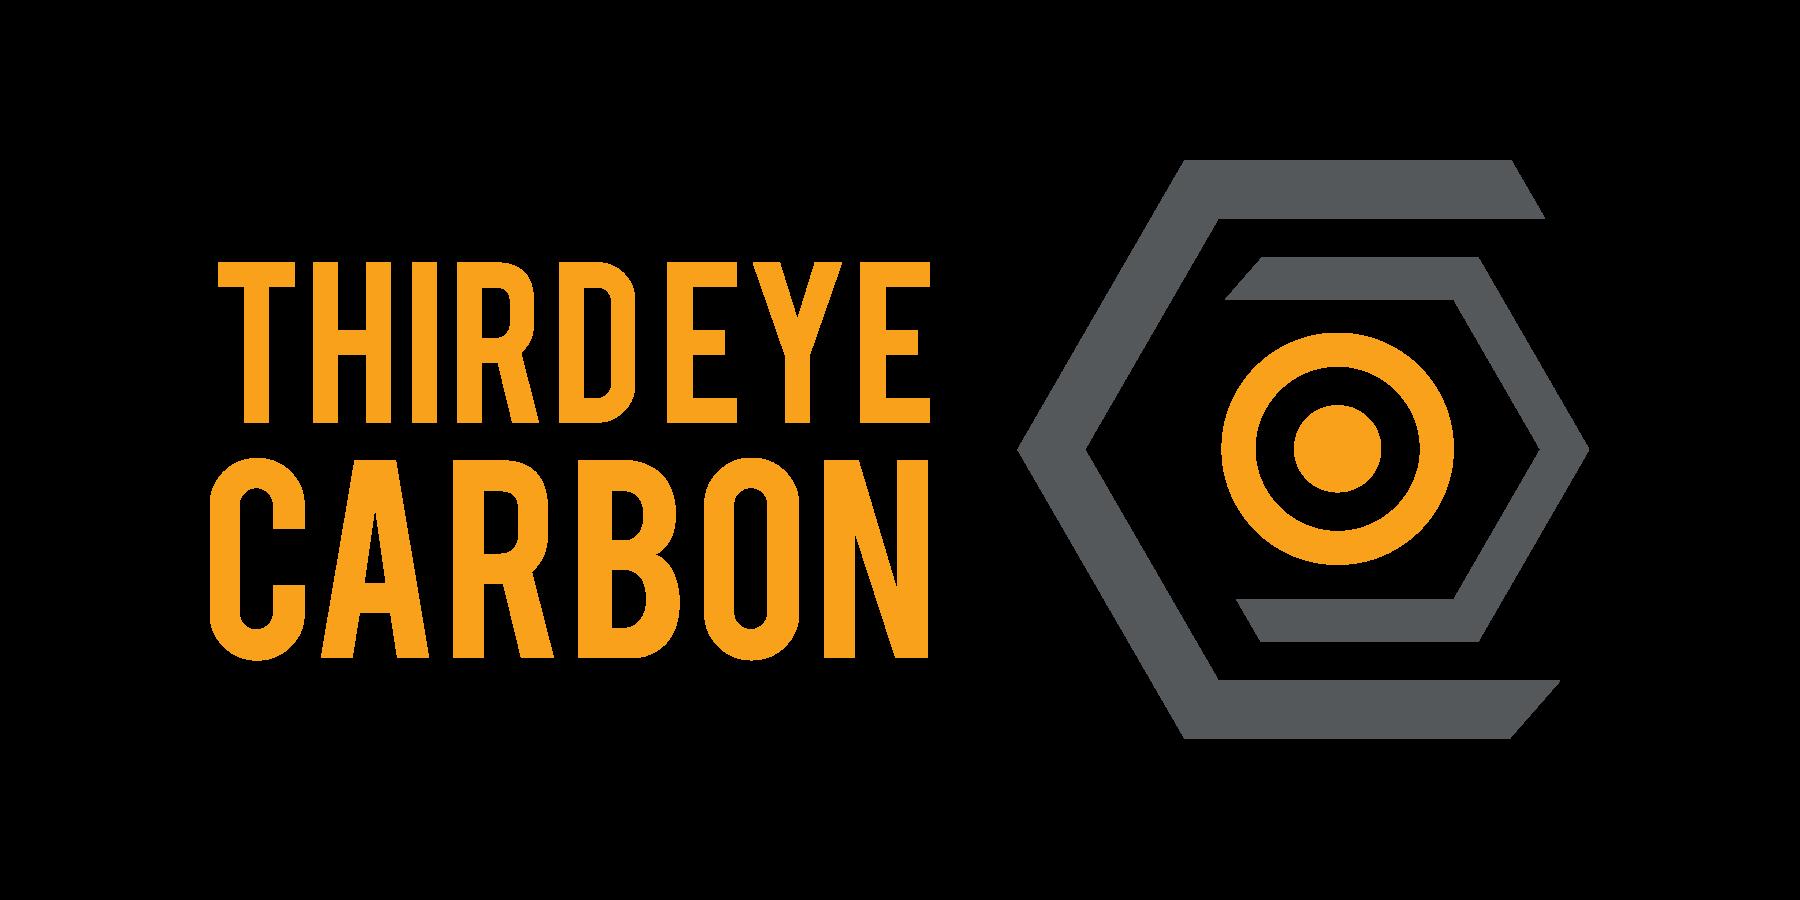 3rdeyecarbon_logo_HORIZ_4c.png